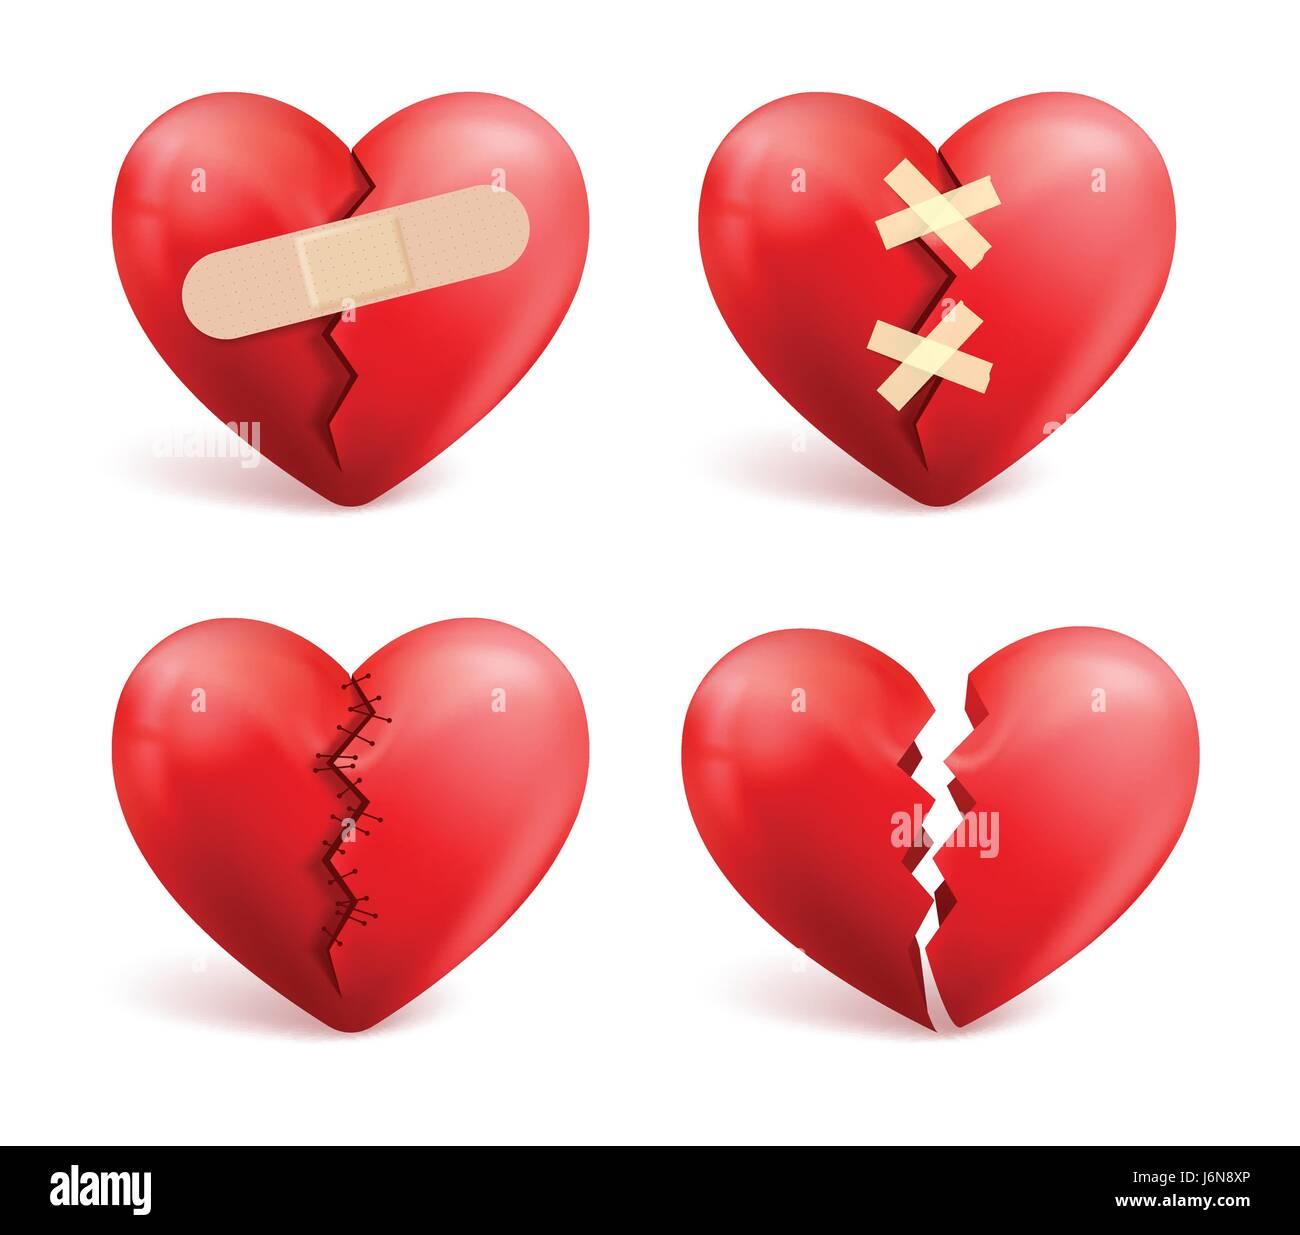 Broken hearts vector set of icons and symbols in red color with broken hearts vector set of icons and symbols in red color with wound patches buycottarizona